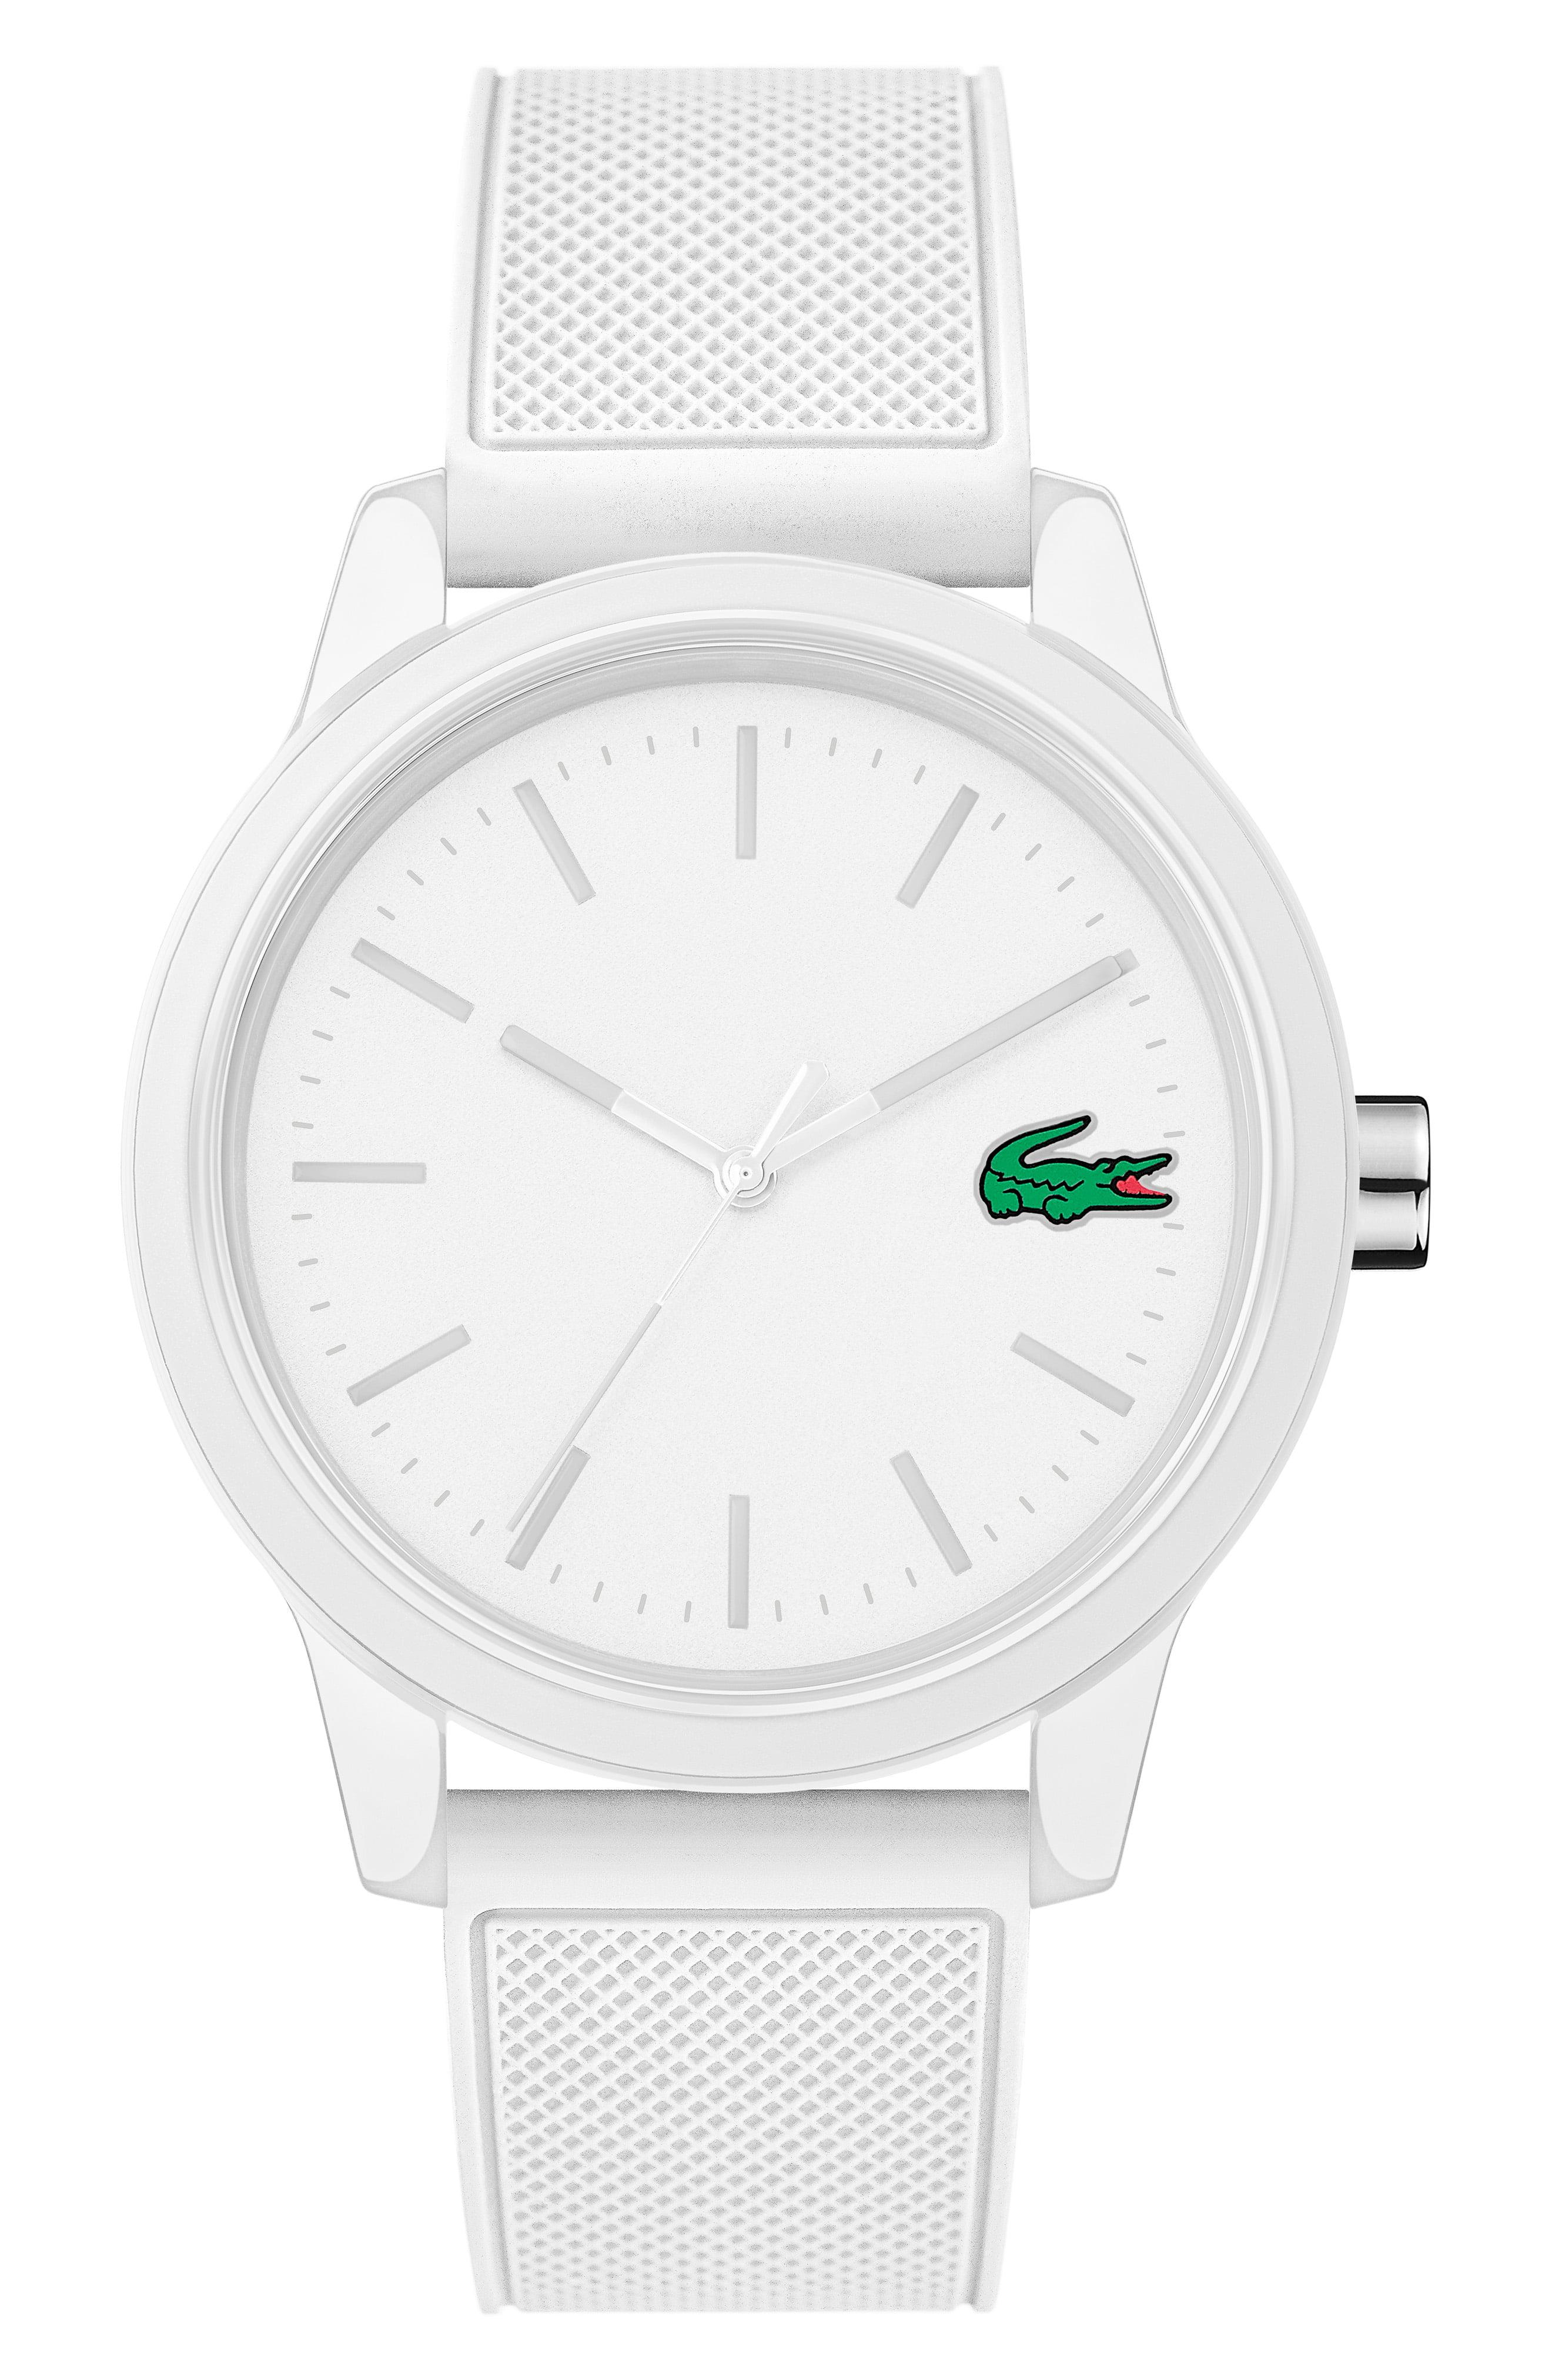 47e69ff2d4 Lyst - Lacoste 12.12 Rubber Strap Watch